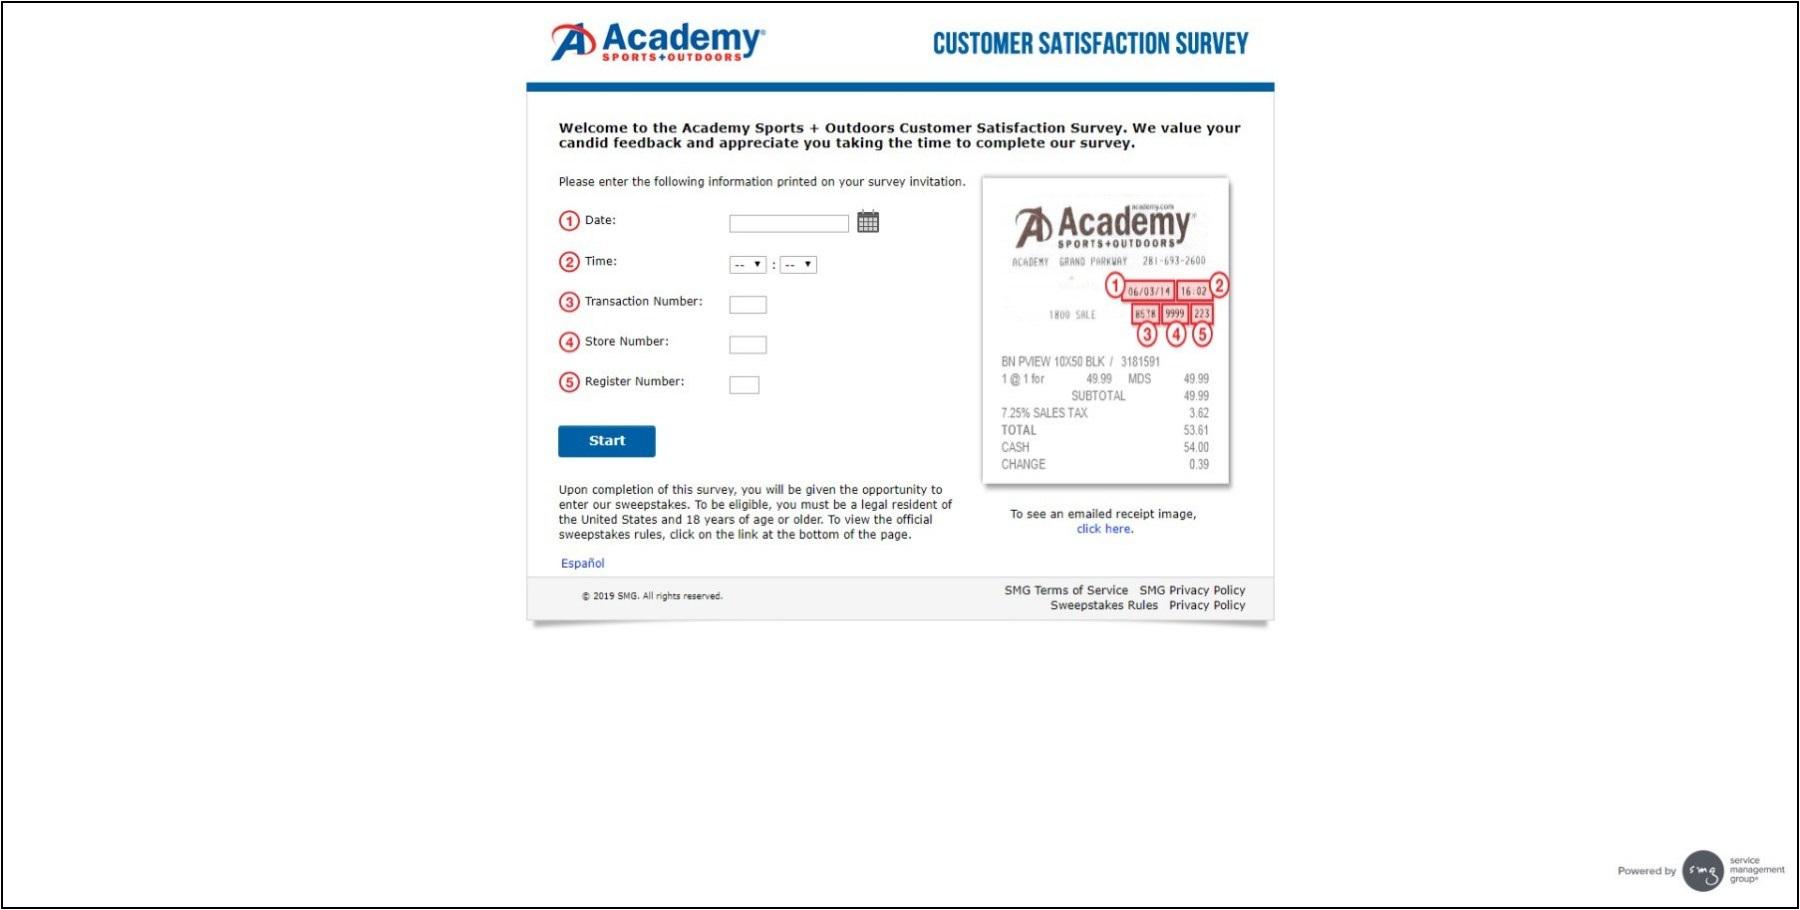 www.AcademyFeedback.com